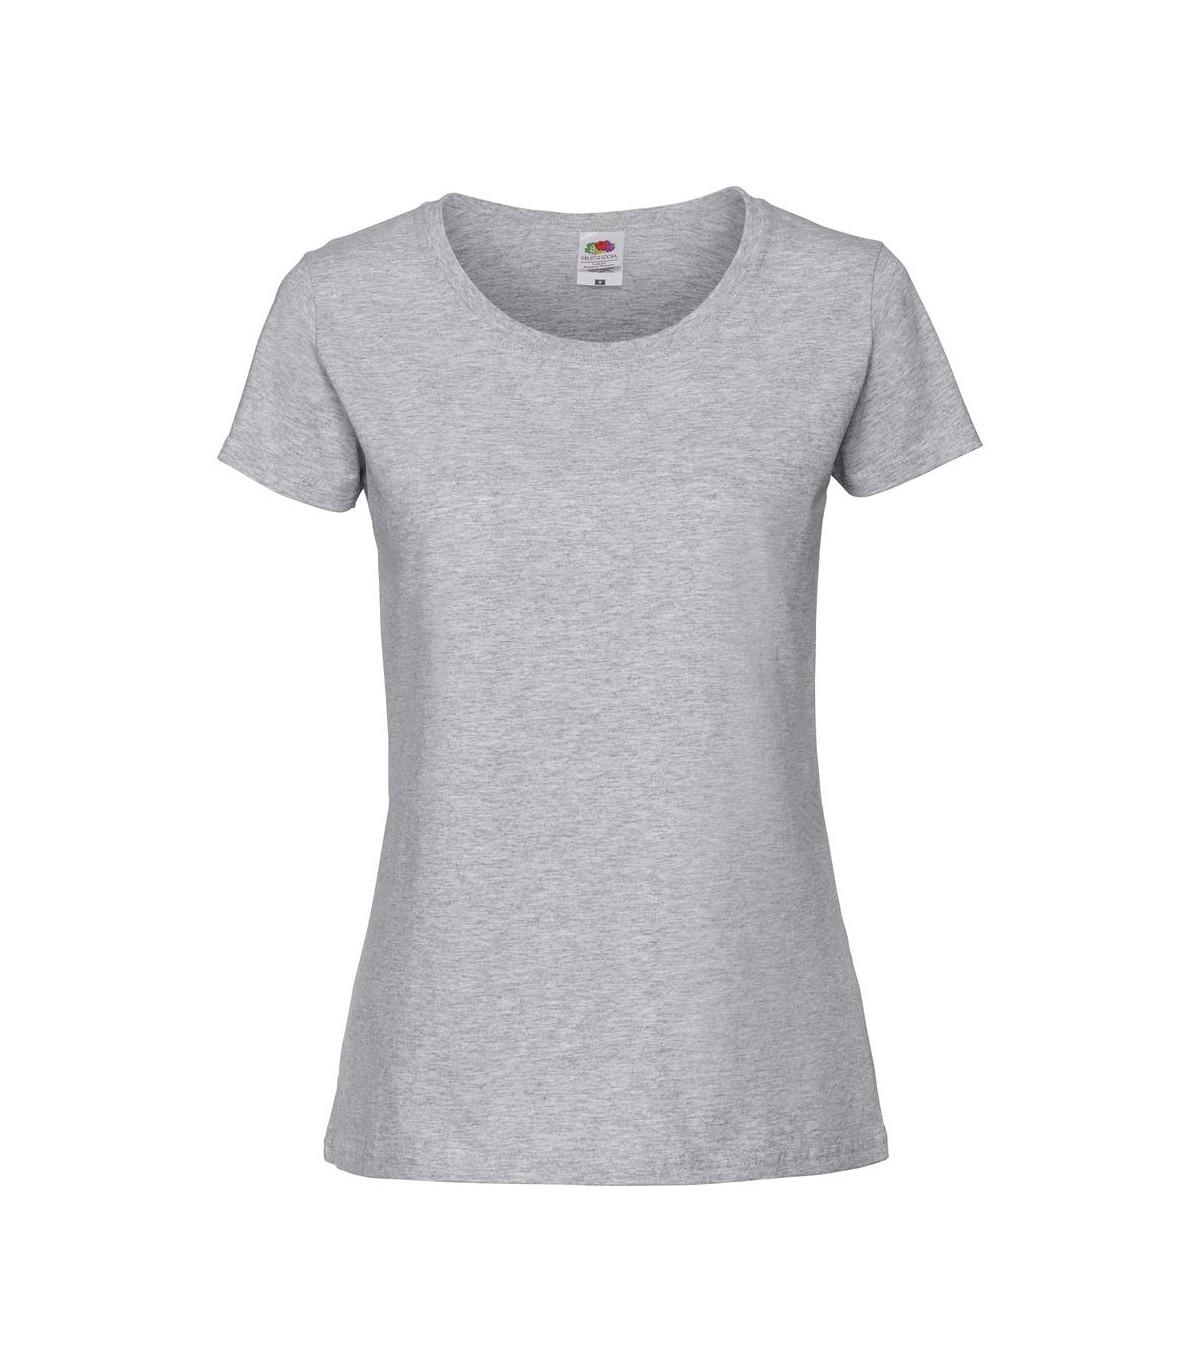 a3cd8466944fa1 Koszulka Ringspun Premium Lady-Fit